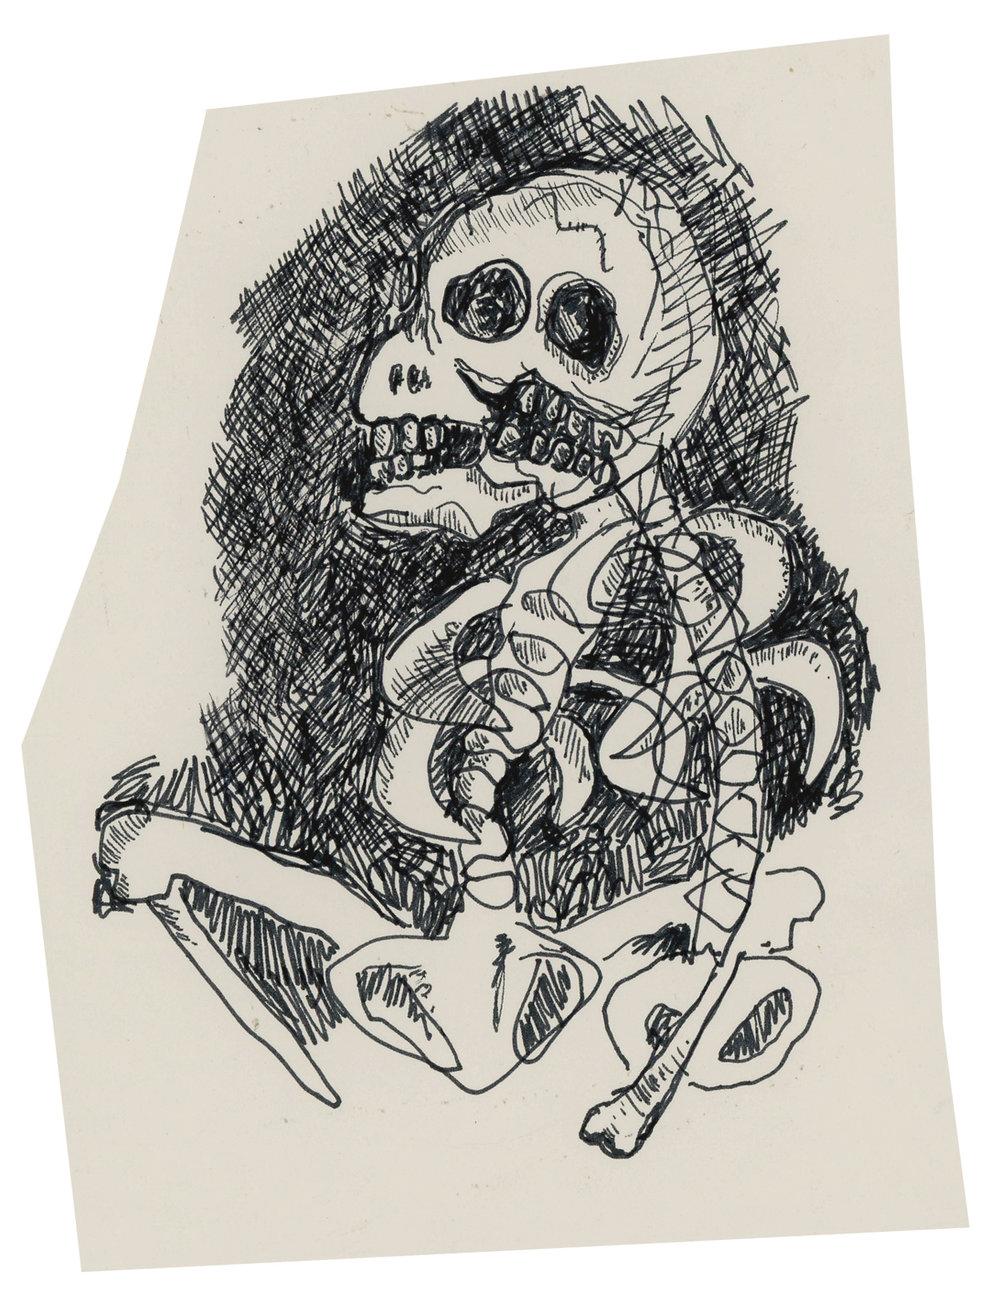 Skeleton / Deformed Man, undated